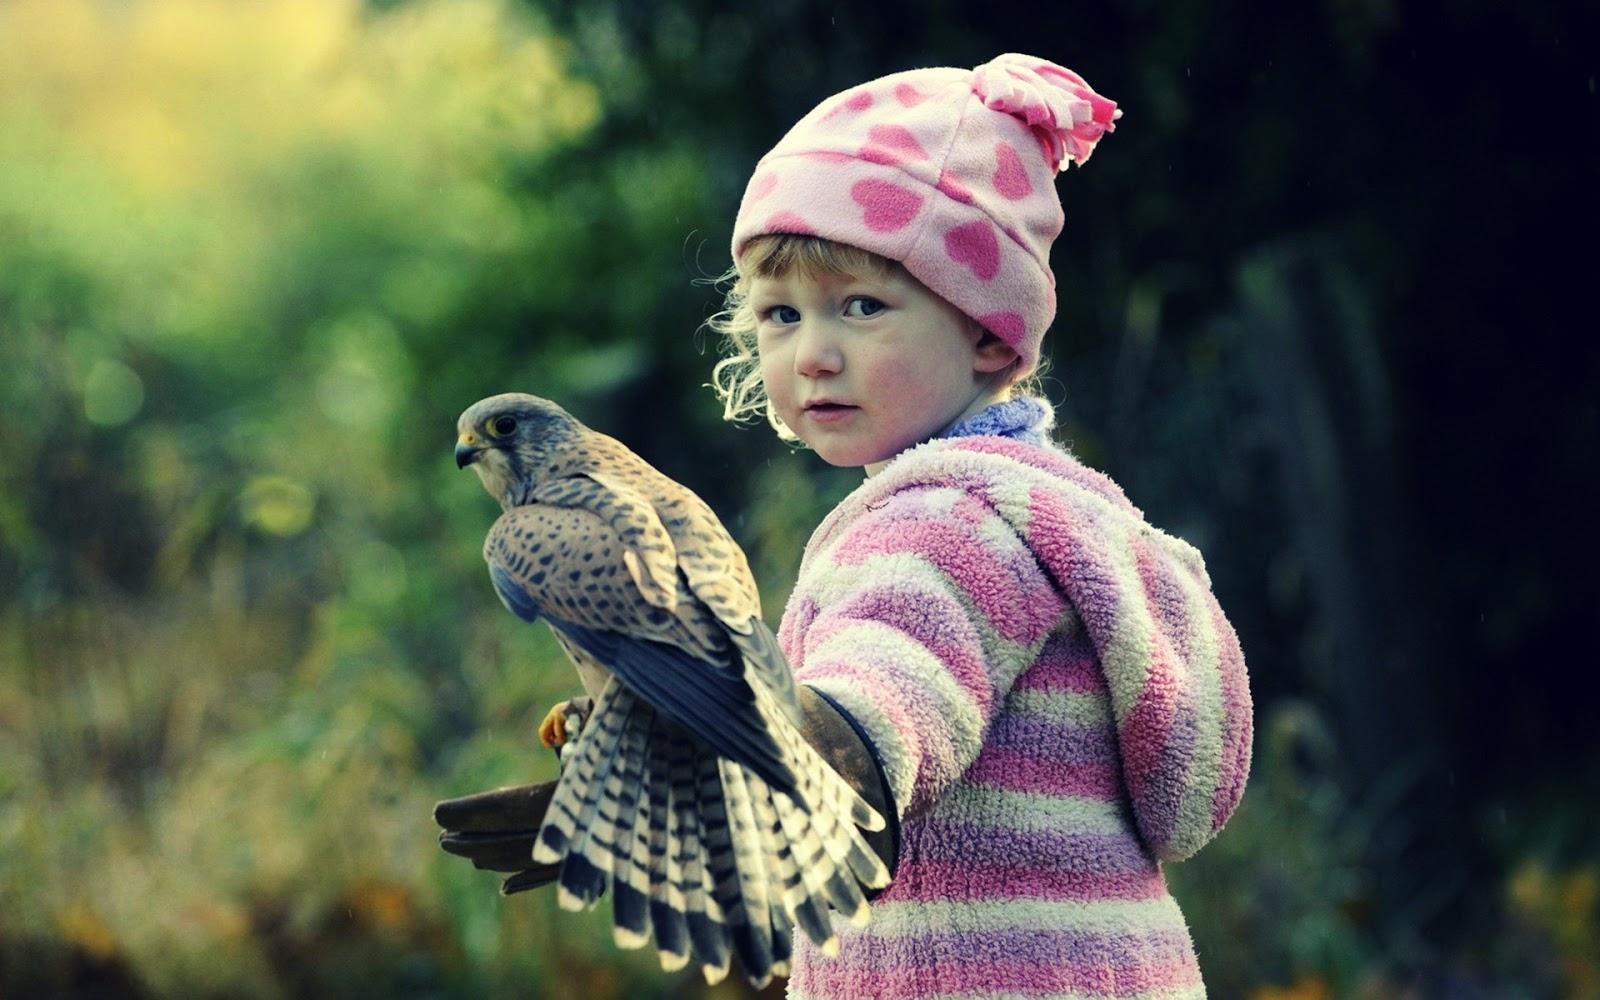 Cute Baby Girl Child Wallpaper خلفيات اطفال بنات 2018 صور اطفال بنات جميلة يلا صور